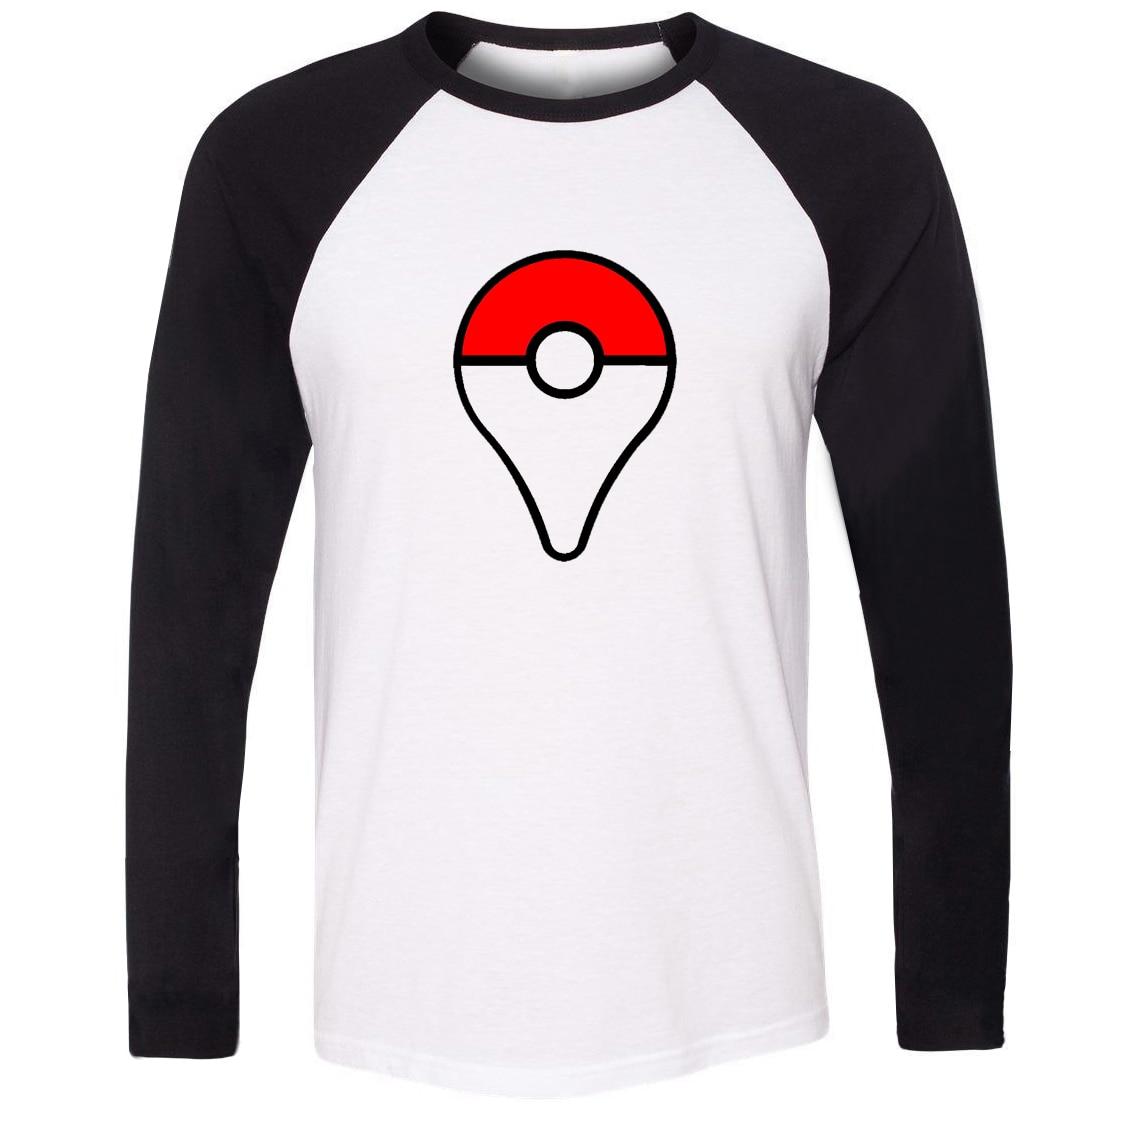 new-unisex-t-shirt-font-b-pokemon-b-font-go-plus-poke-ball-pokeball-catch-pikachu-pattern-raglan-long-sleeve-men-t-shirt-boy-print-tee-tops